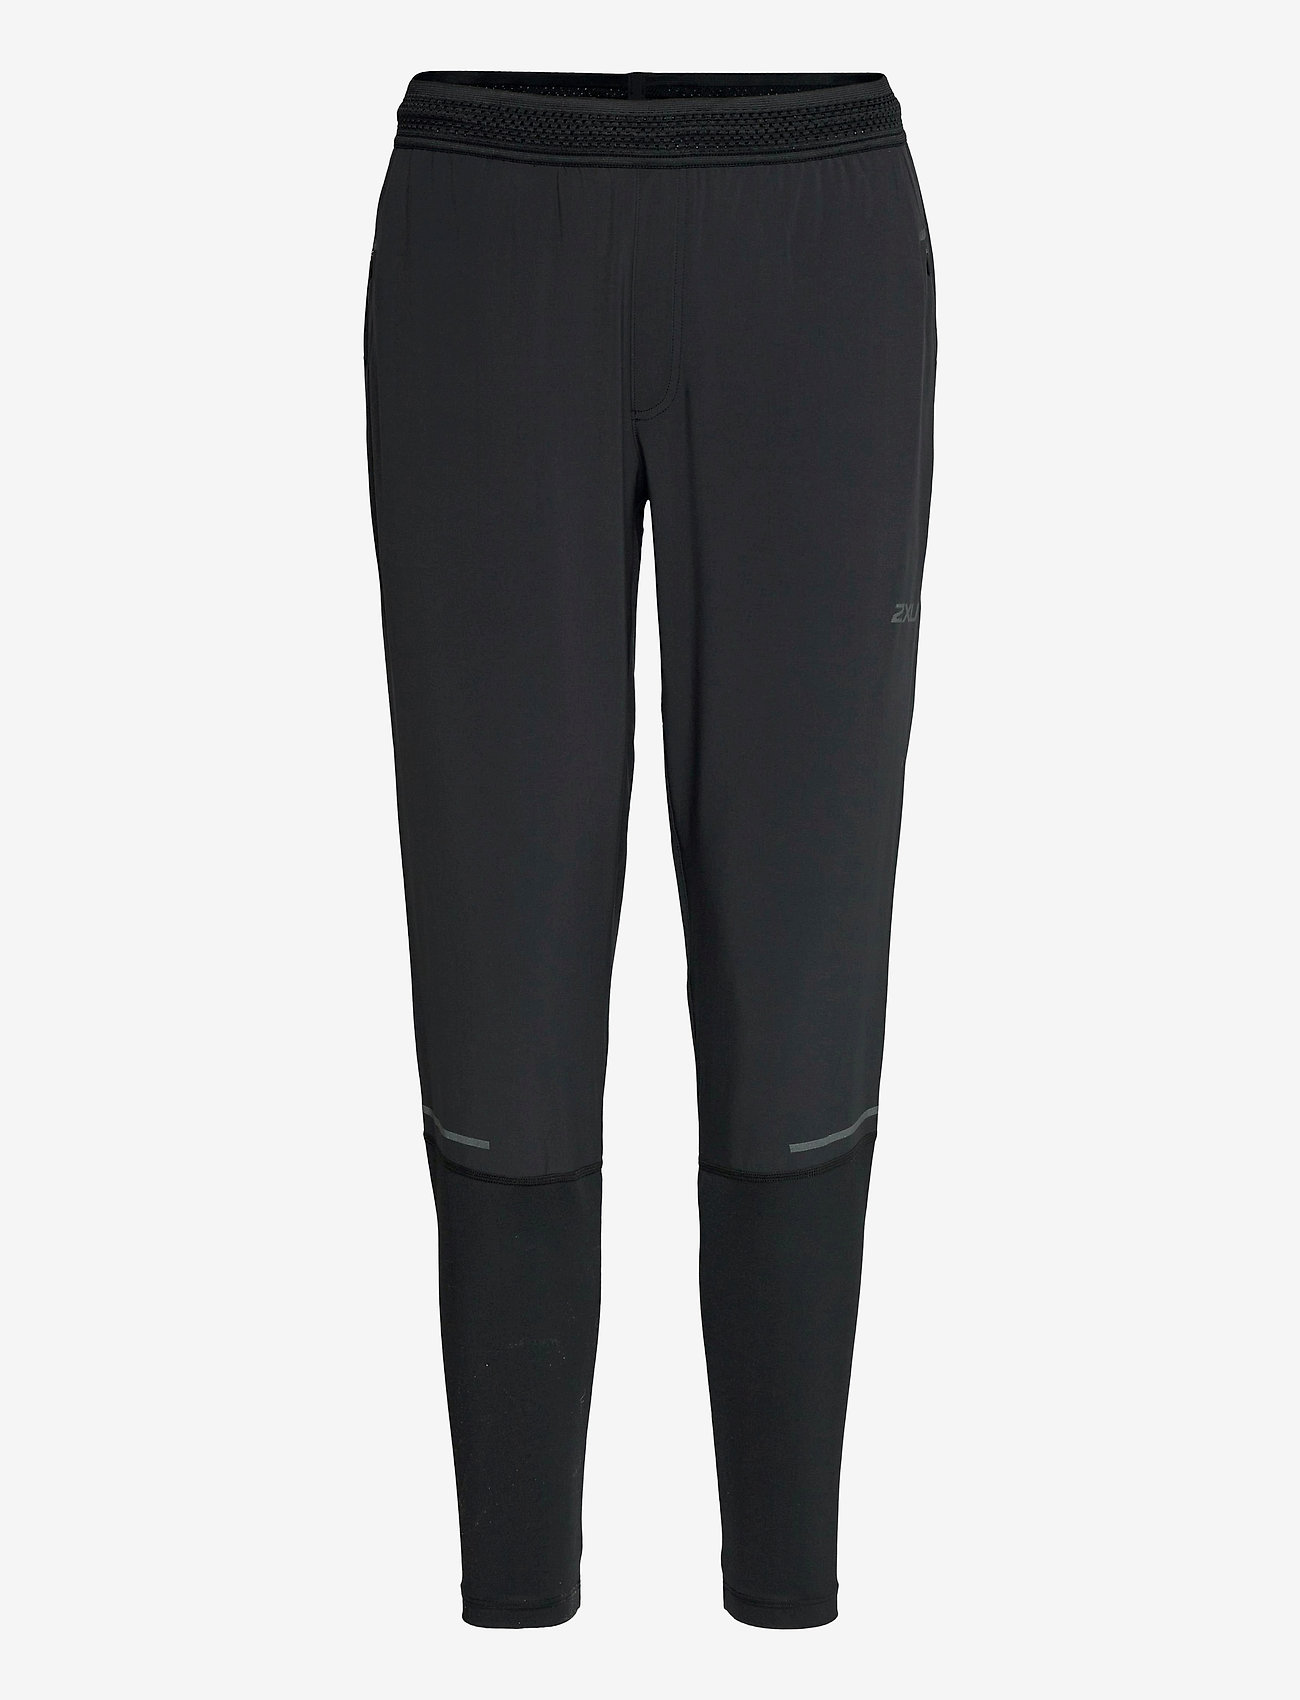 2XU - LIGHT SPEED JOGGER - sportbroeken - black/ black reflective - 0